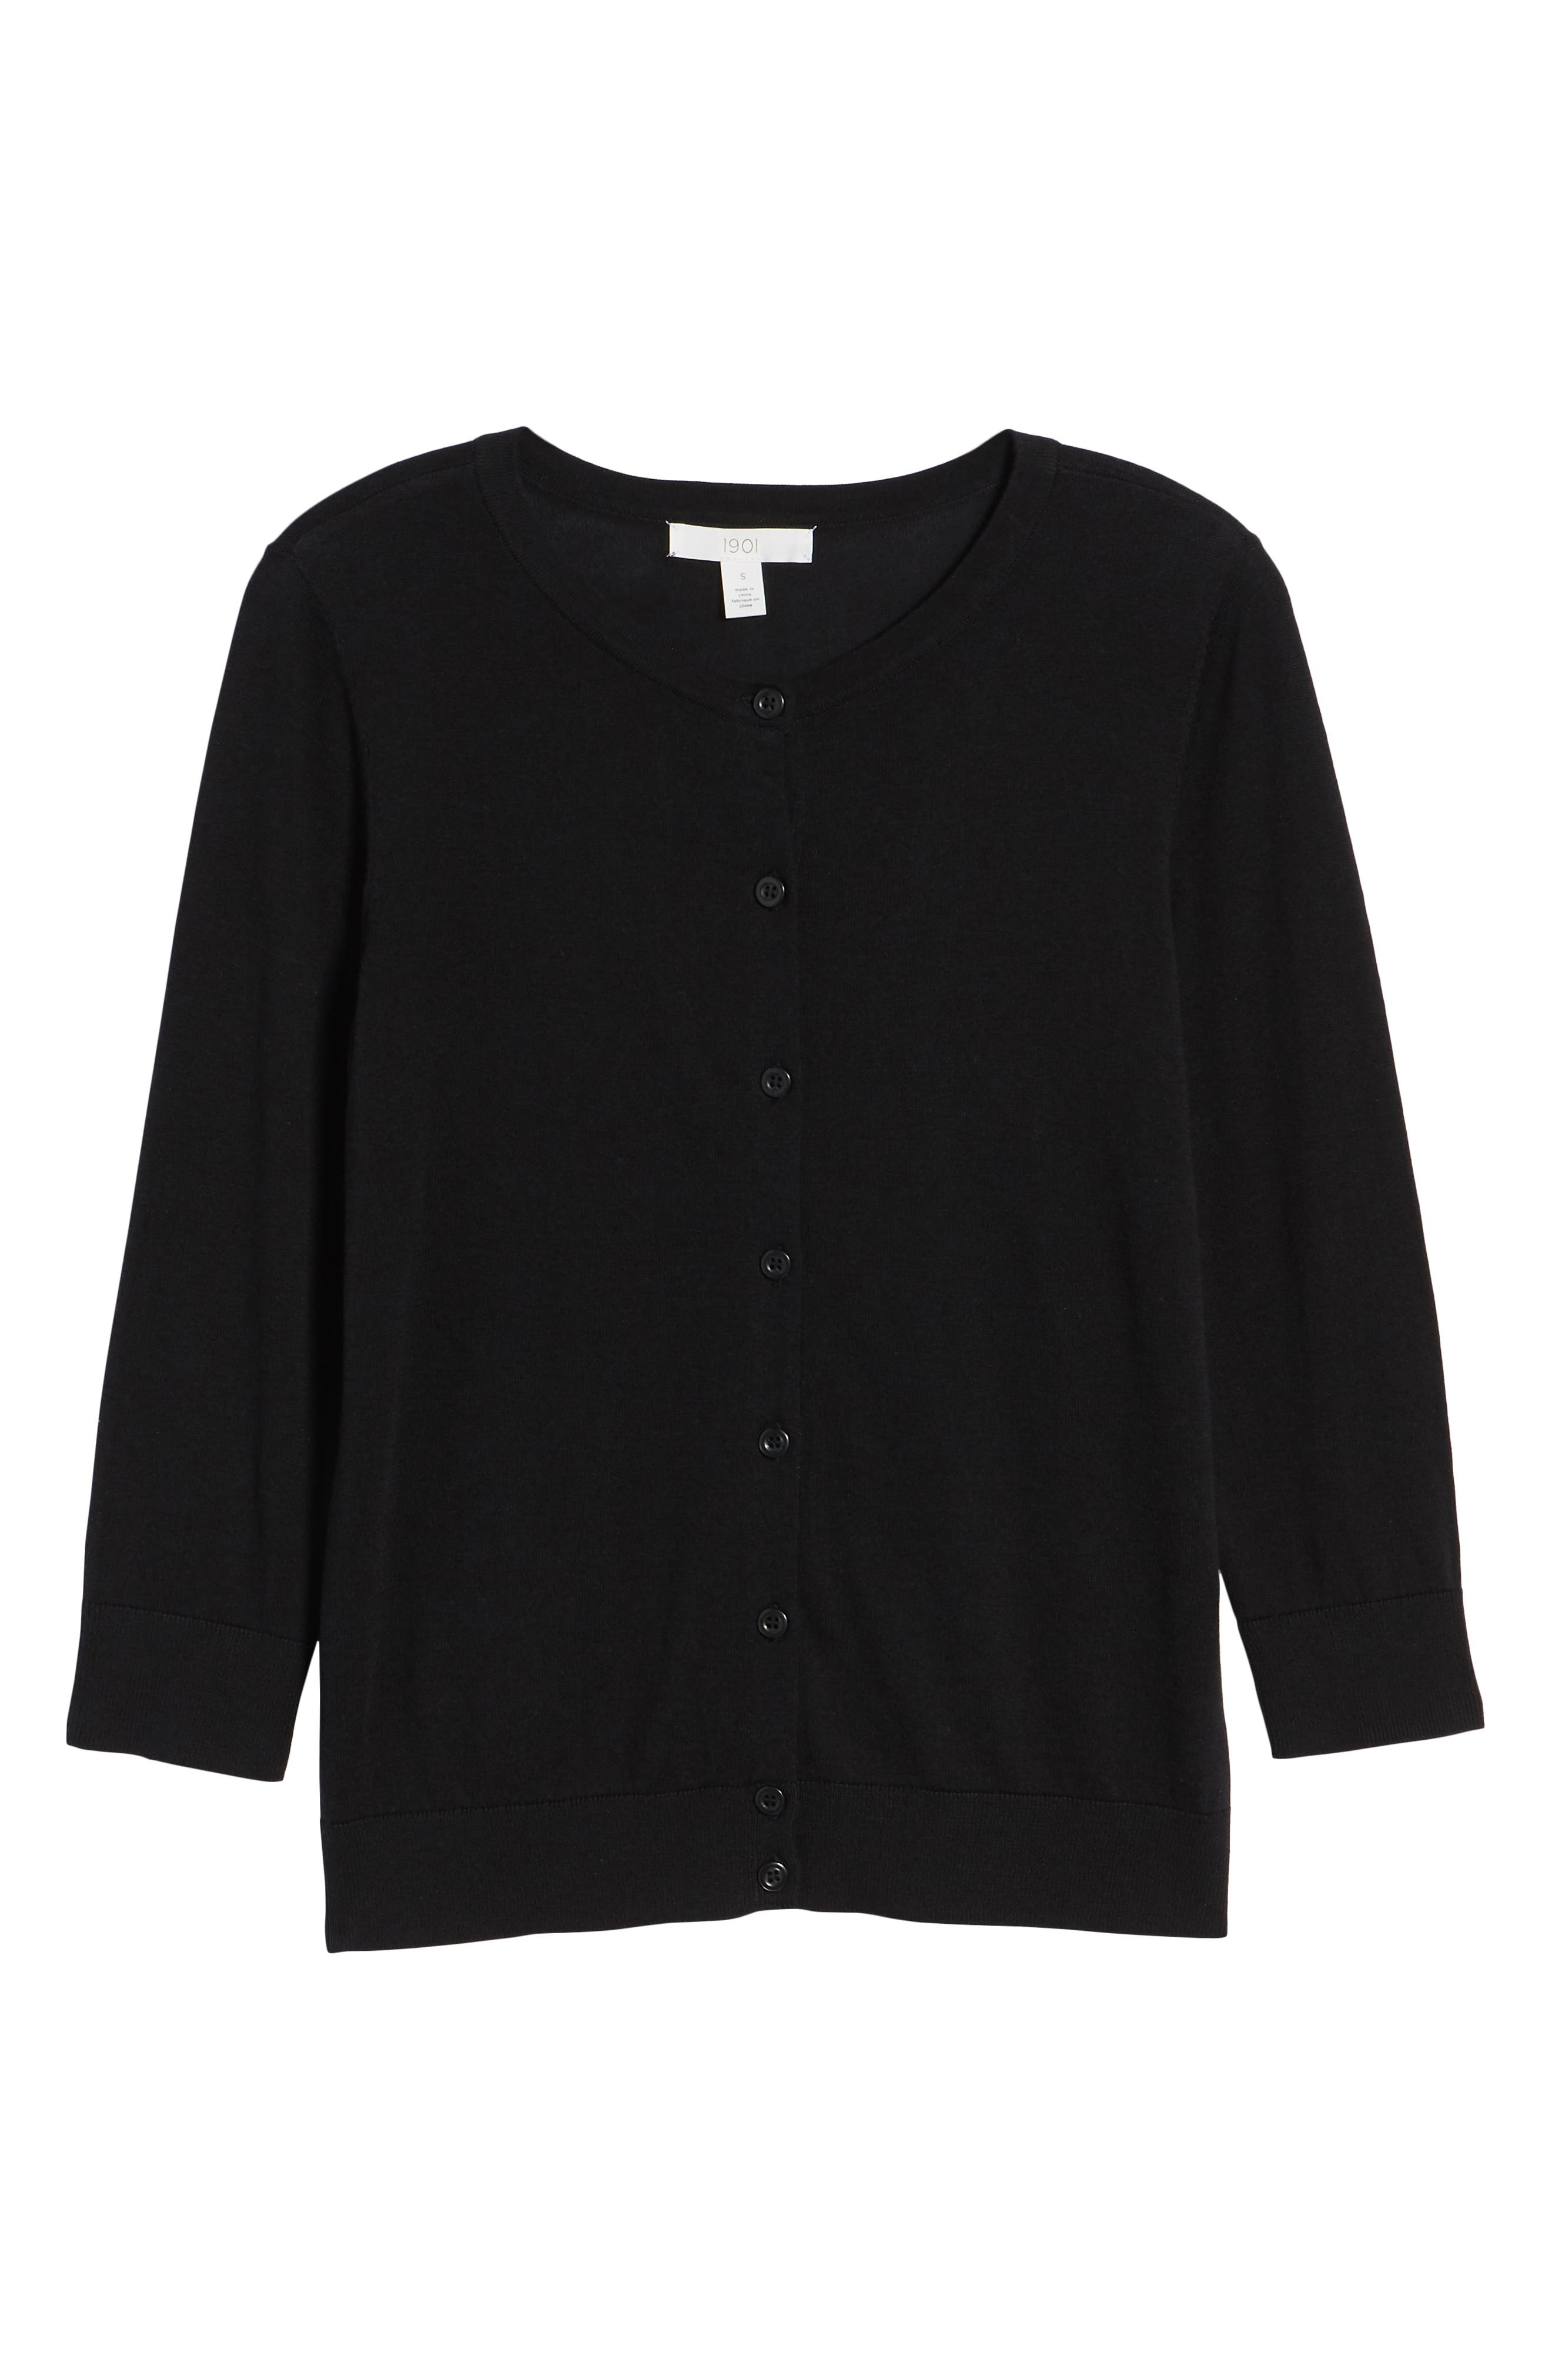 Cotton Blend Cardigan,                             Alternate thumbnail 7, color,                             Black